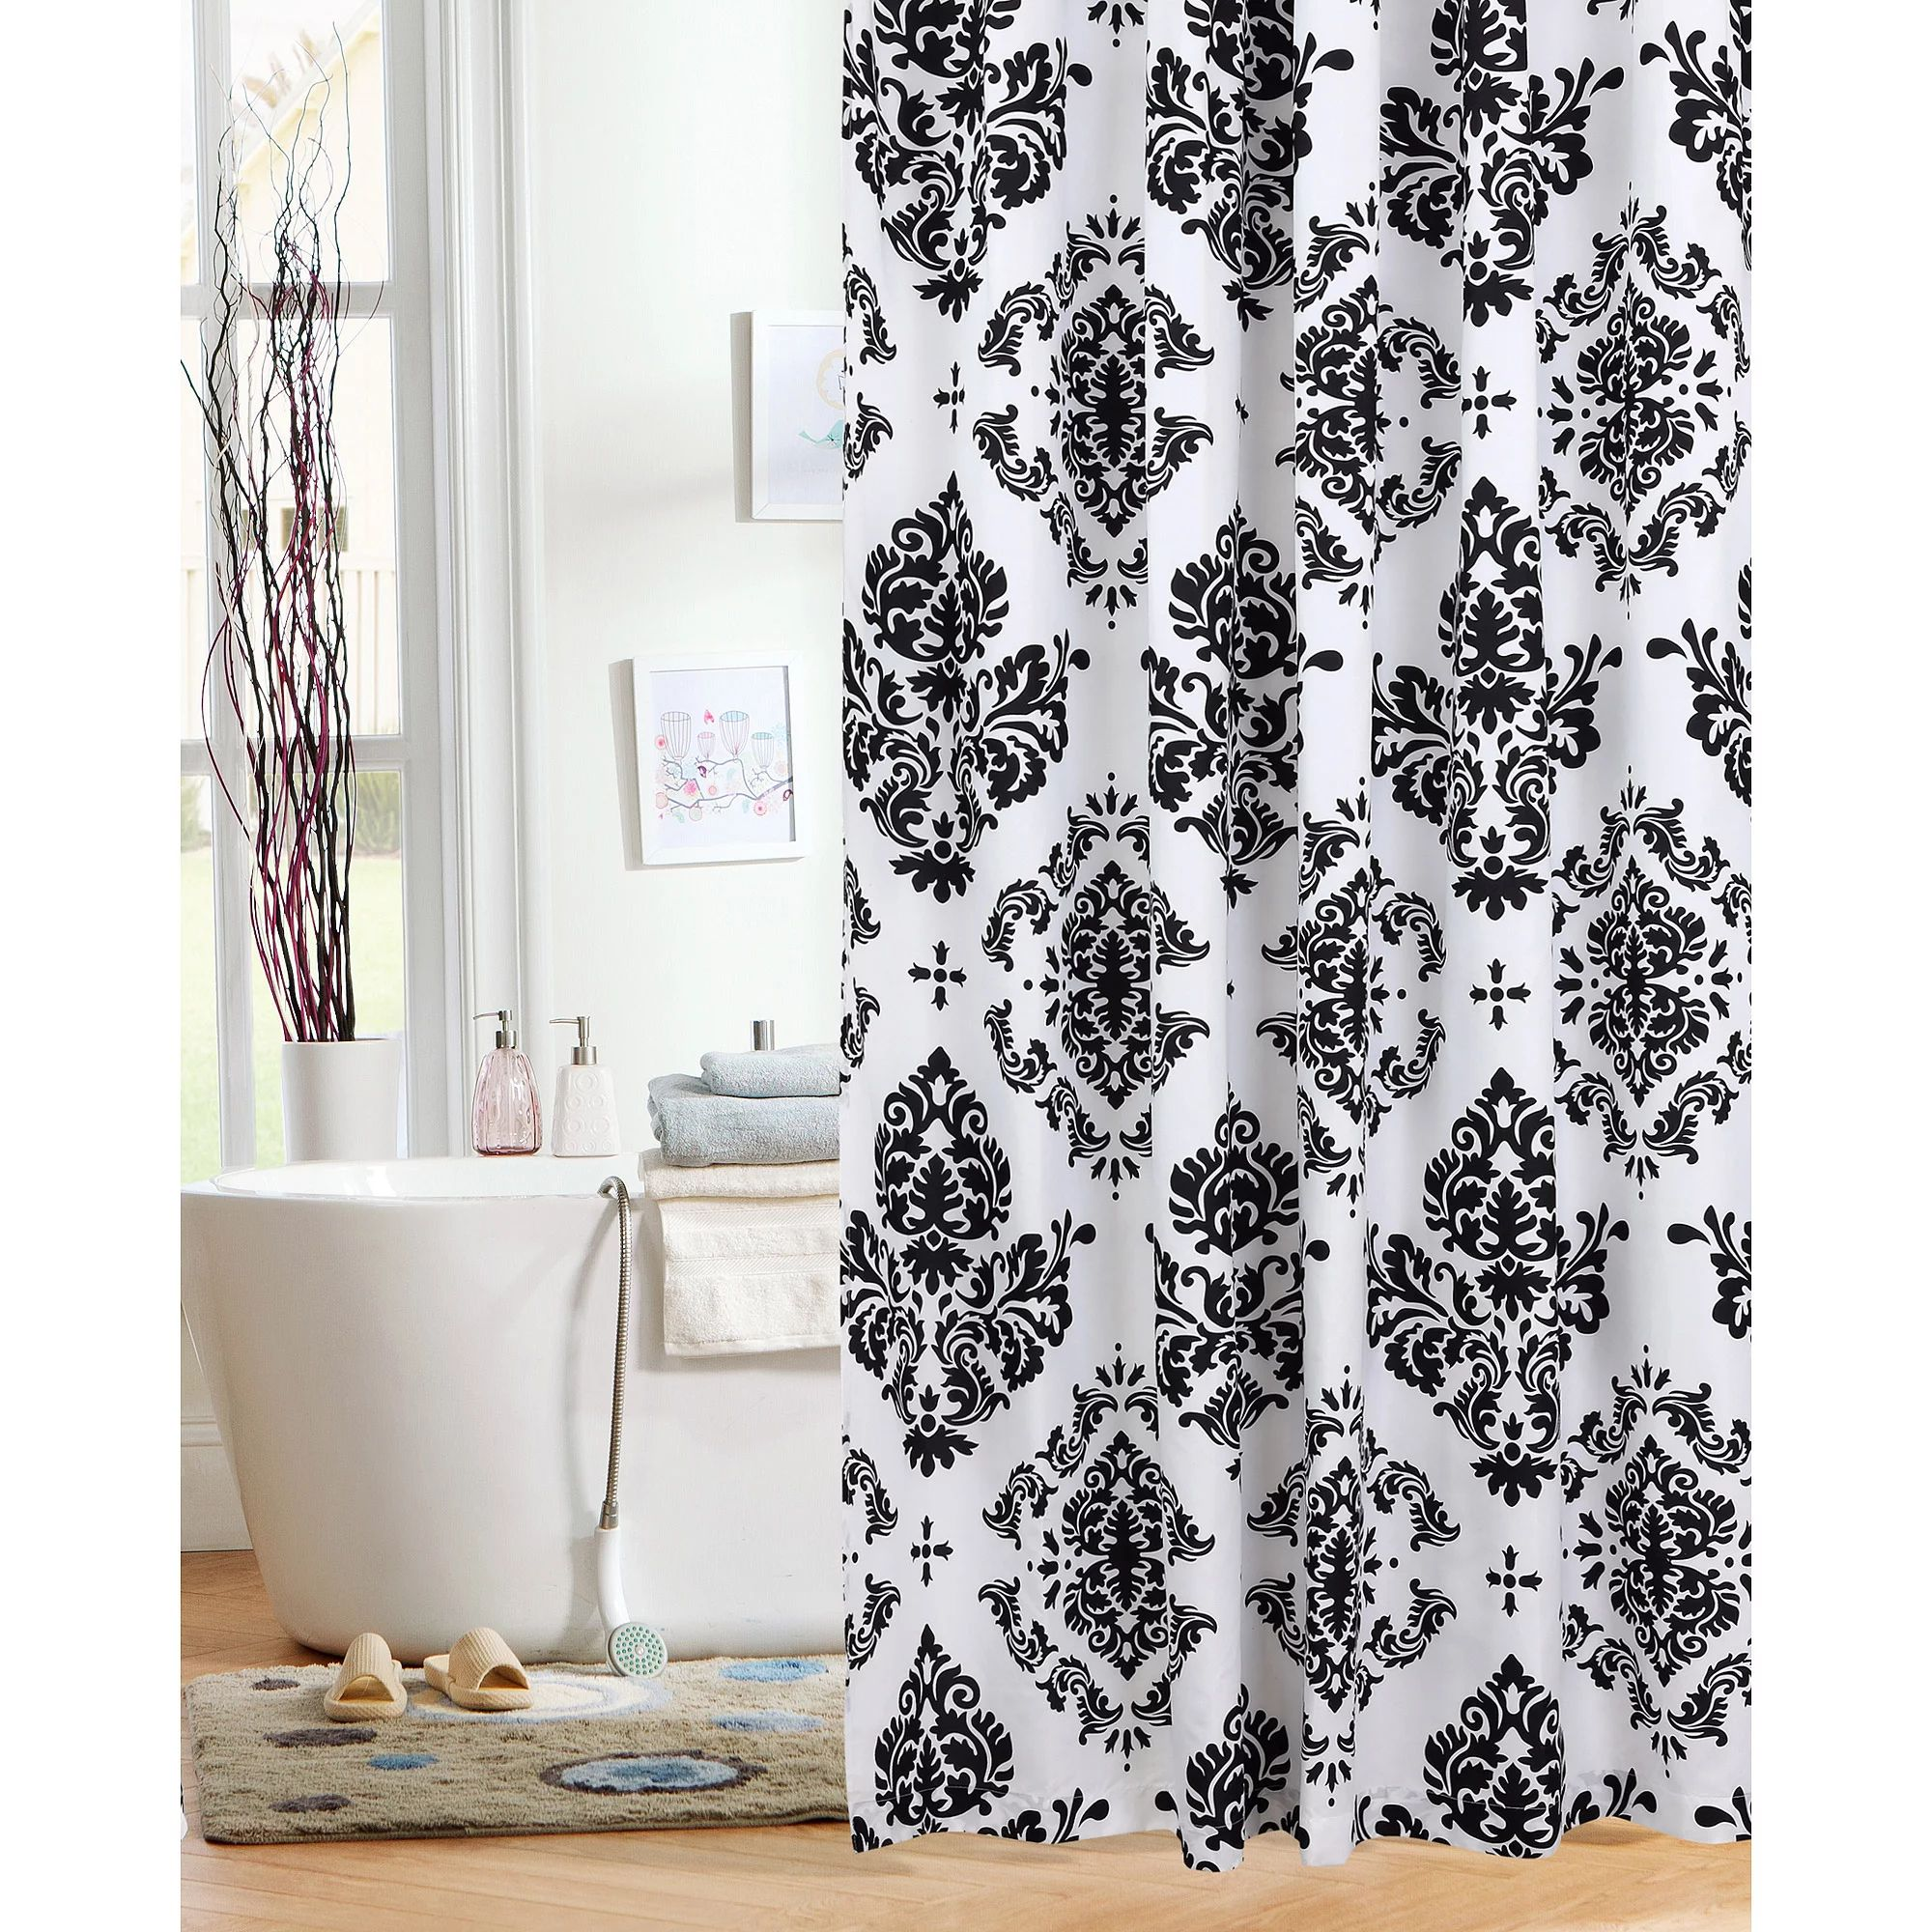 Mainstays classic noir 70 x 72 fabric shower curtain black walmart com